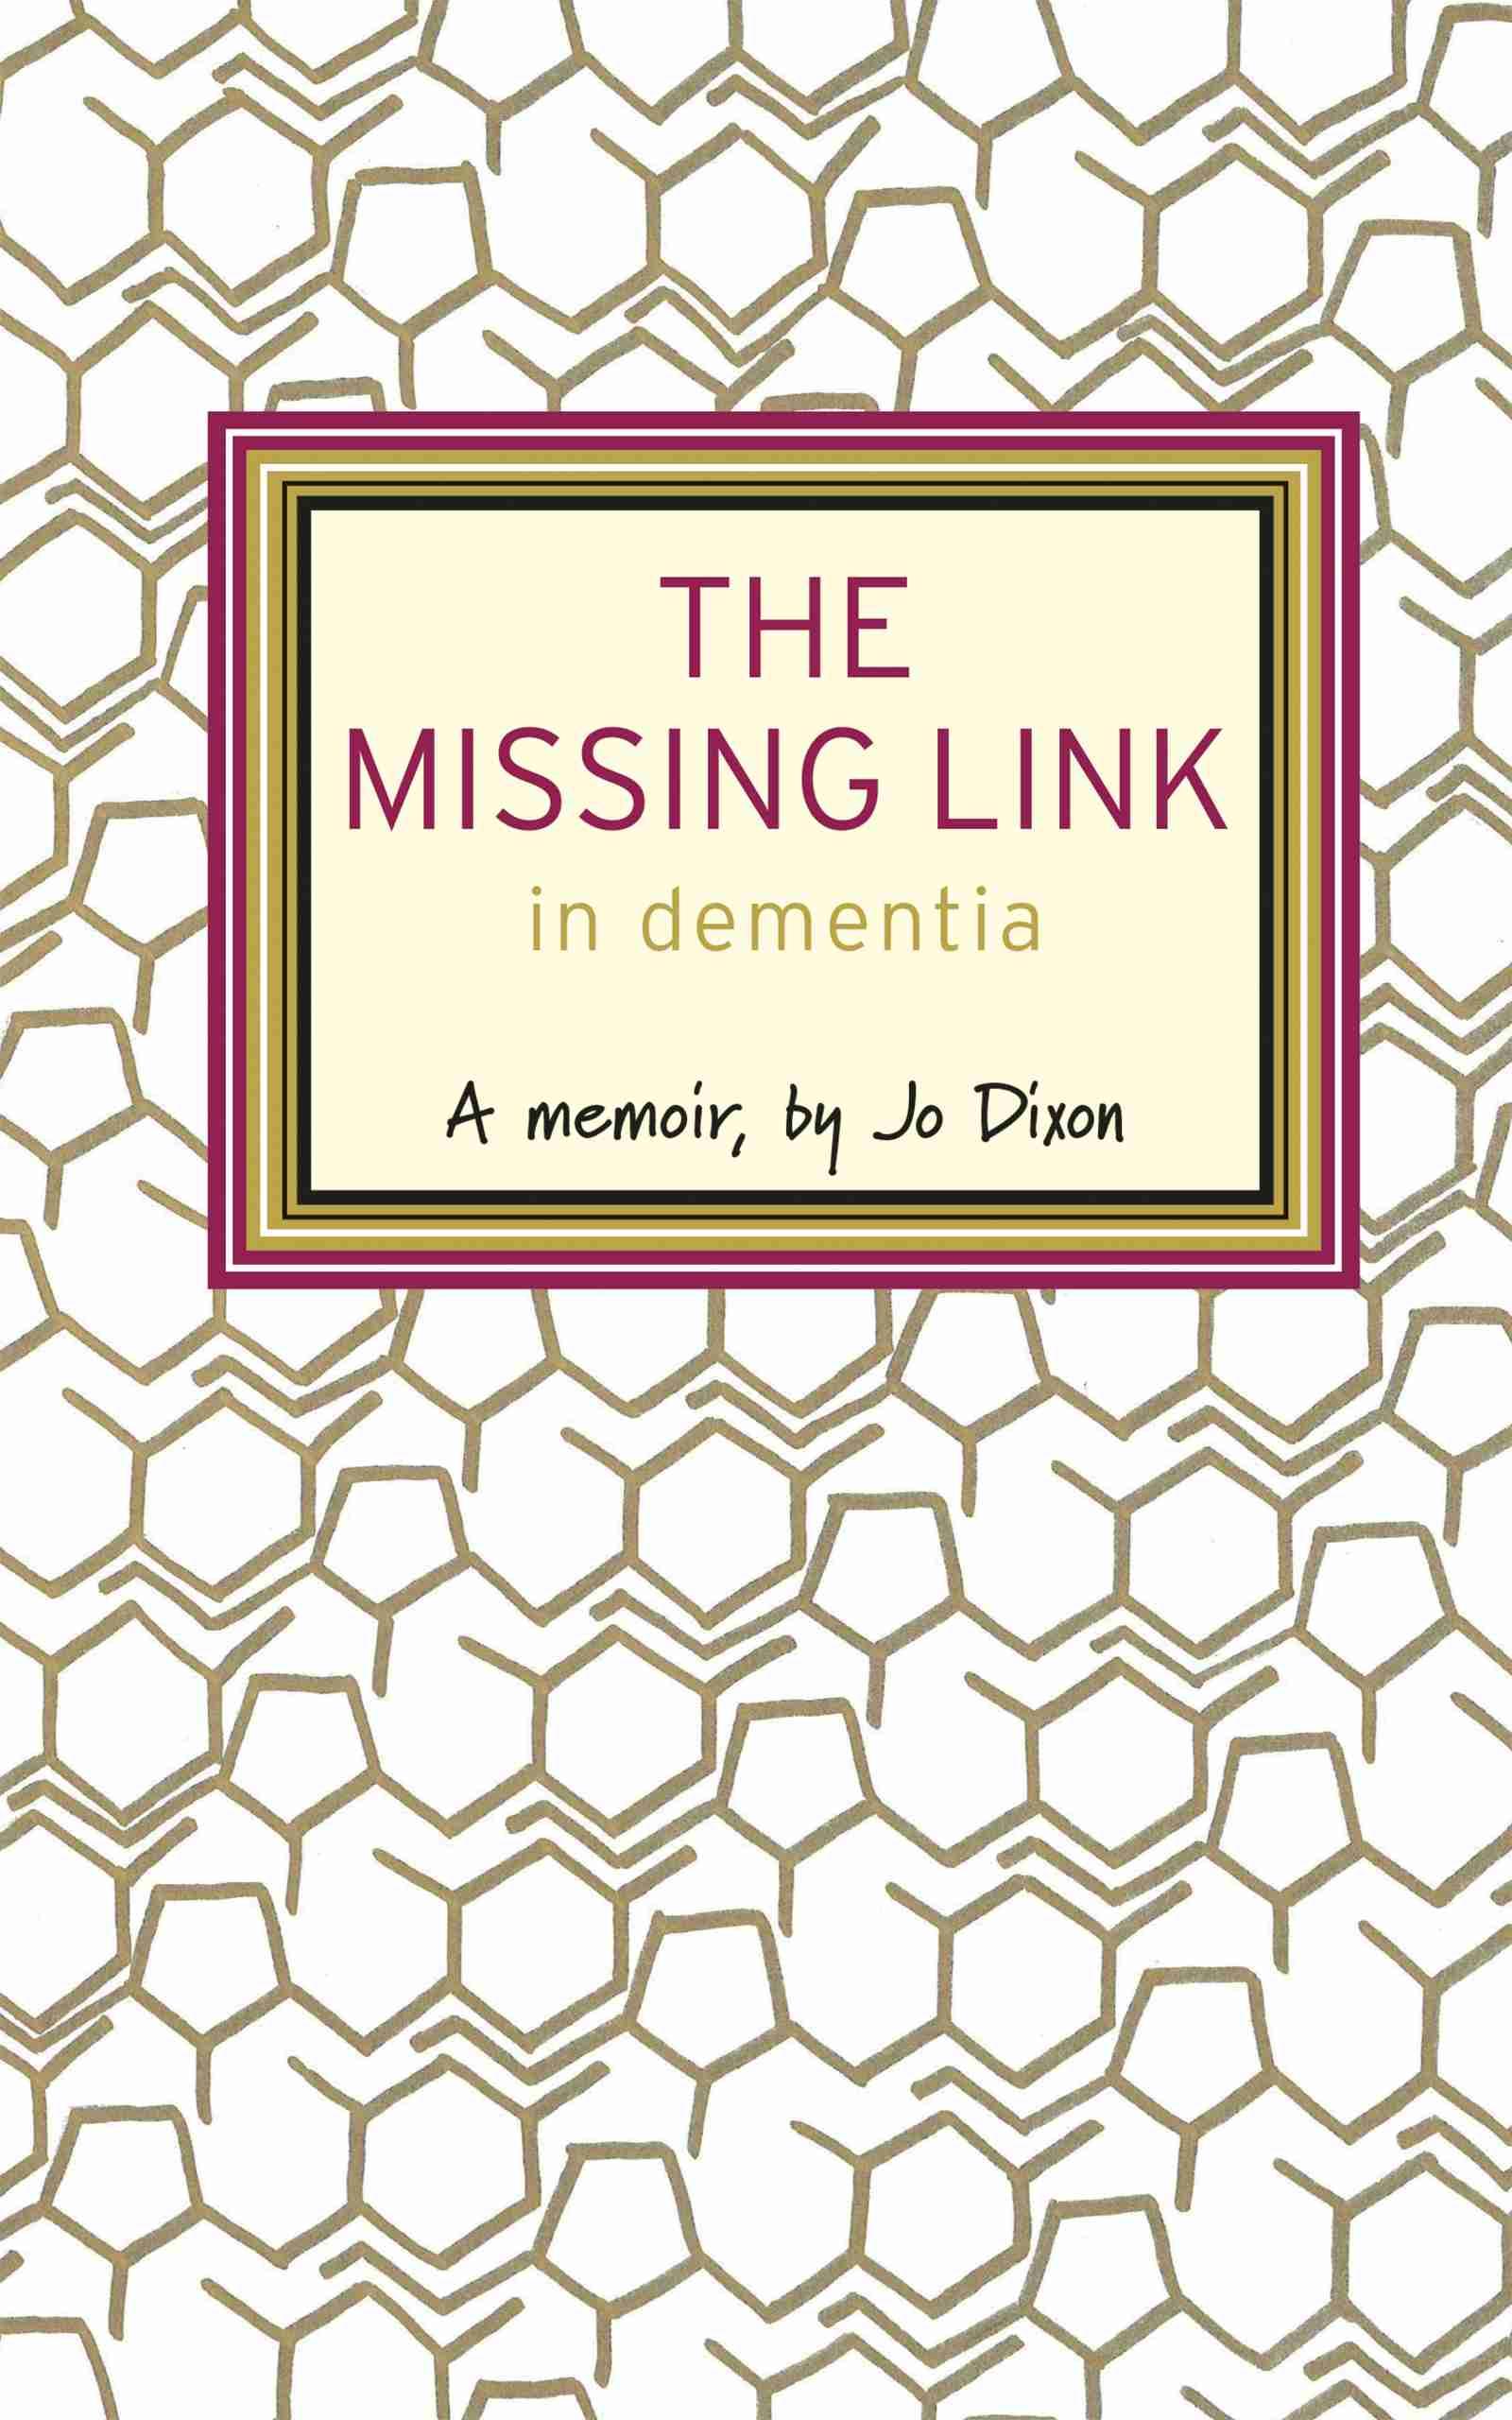 The Missing Link in Dementia: A Memoir by Jo Dixon